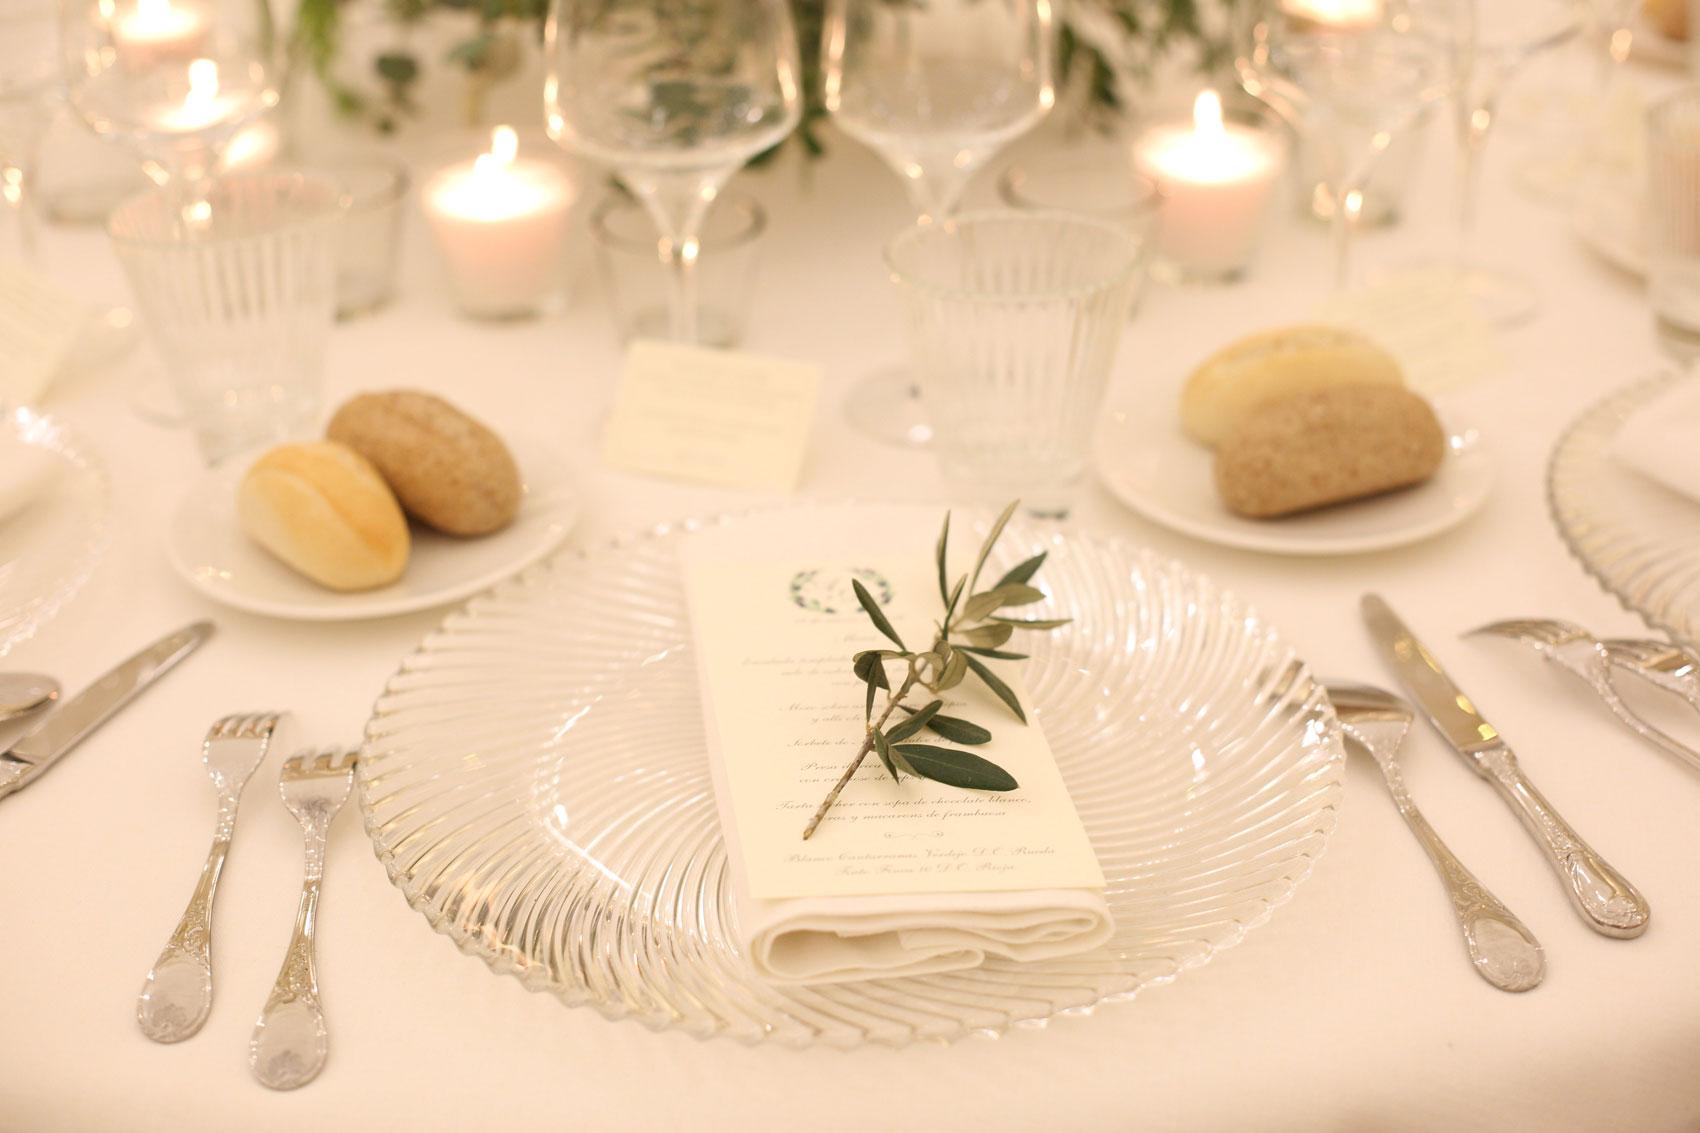 Ramitas de olivo decoración floral boda elegante Andalucía